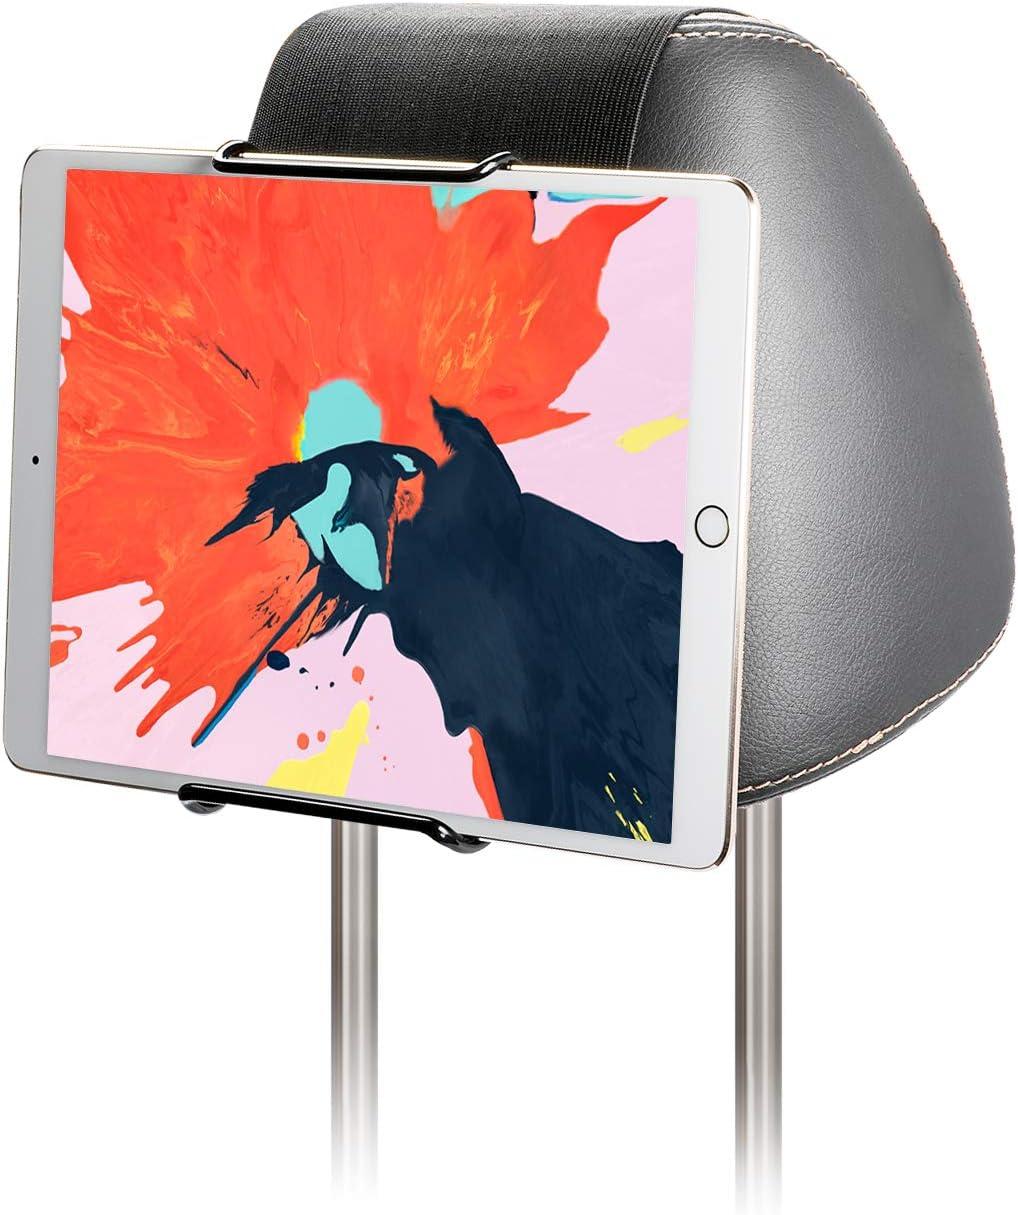 Ranking TOP4 Hikig Car Headrest gift Mount Holder for iPad 7-11